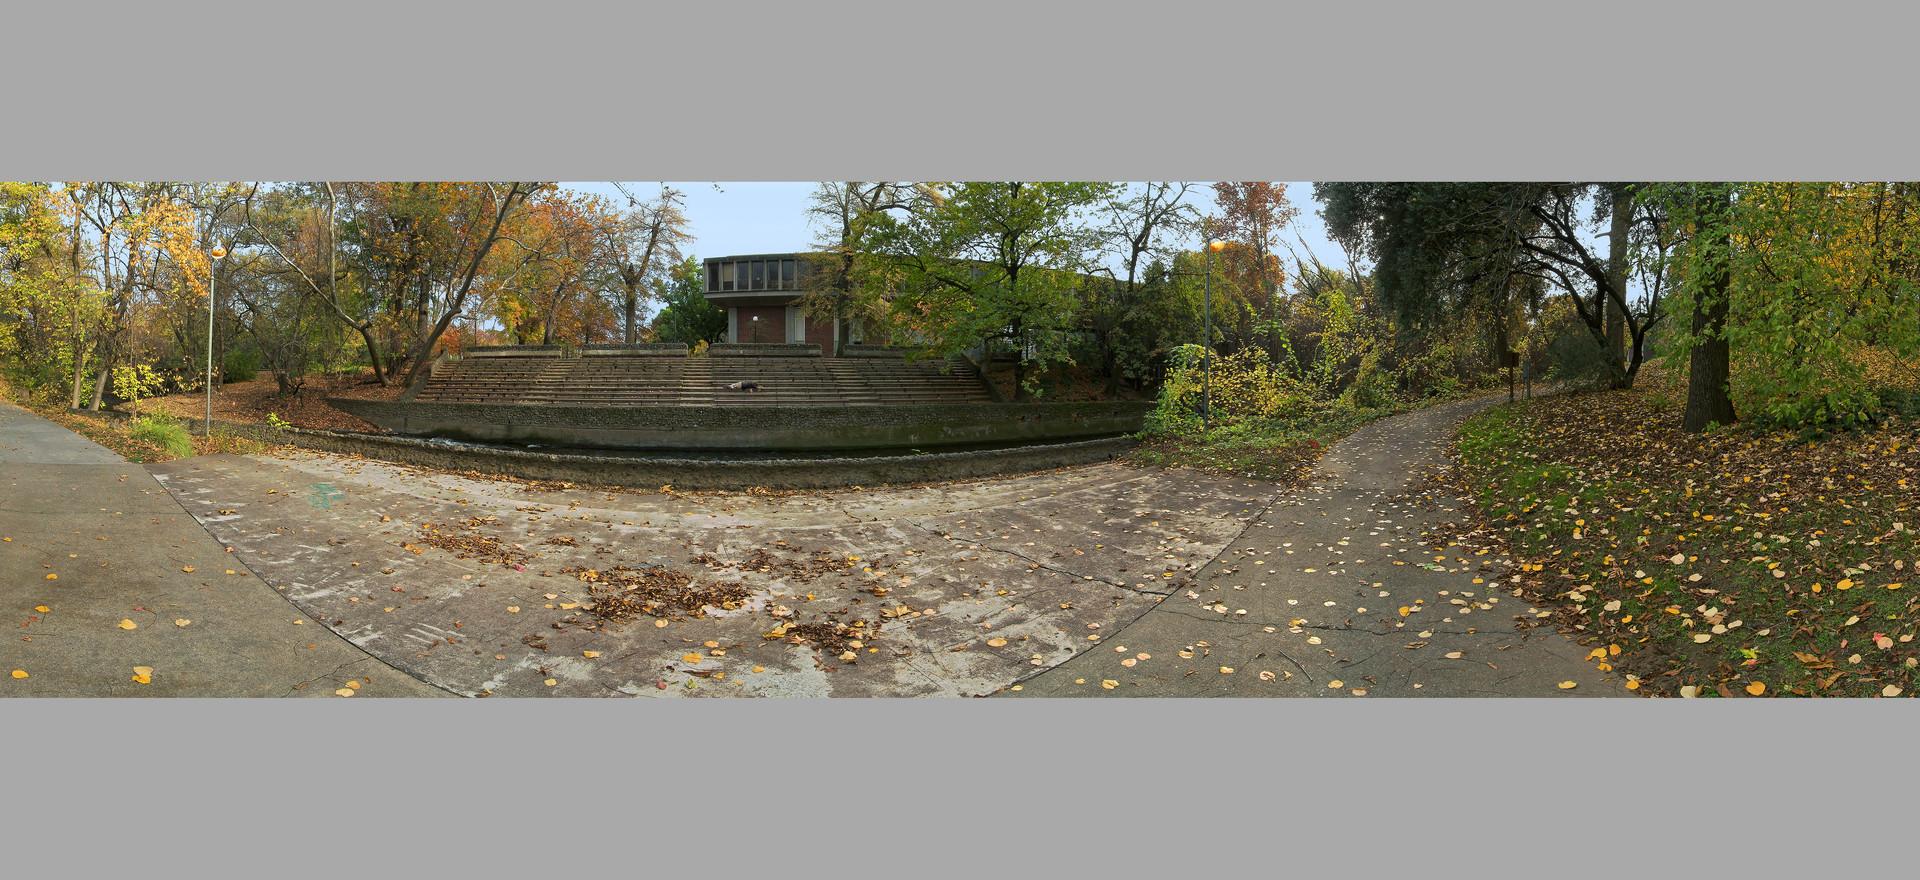 Amphitheater #3, CSU, Chico, Ca